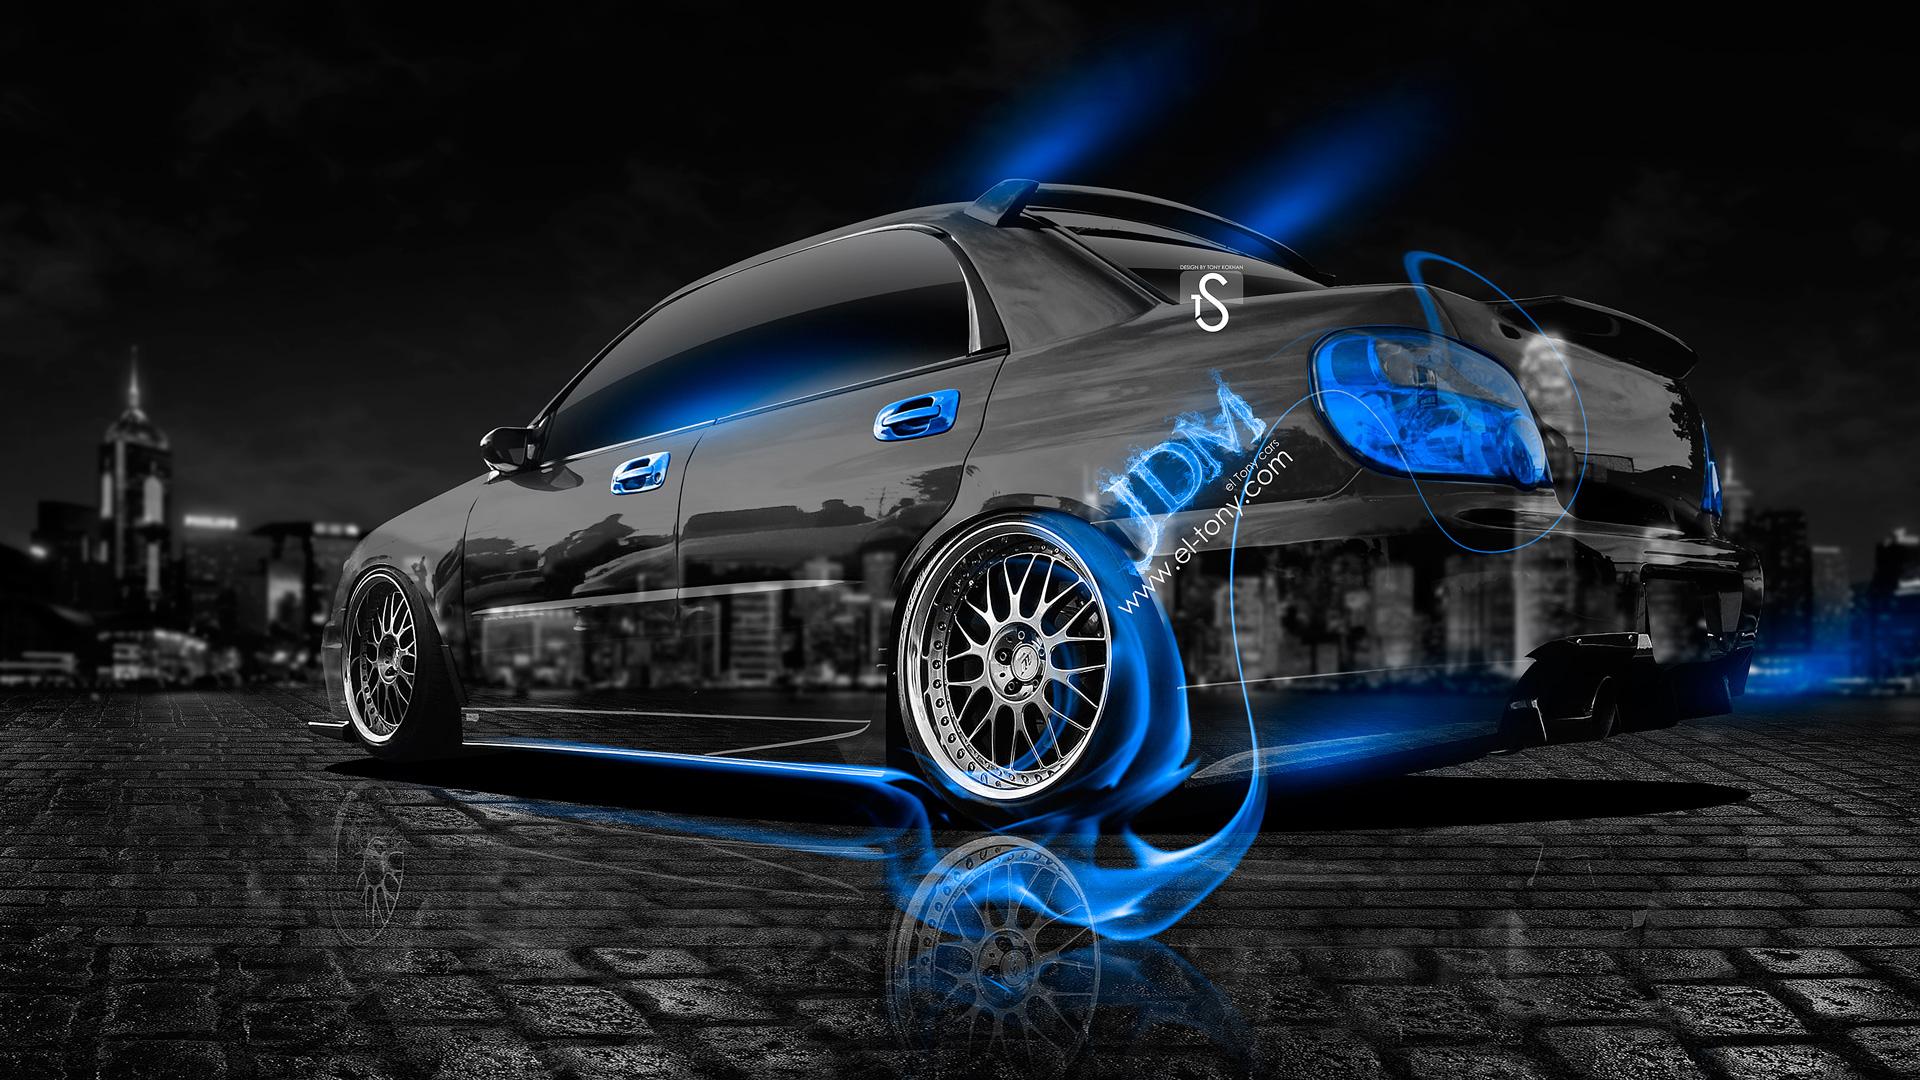 Subaru Impreza WRX STI JDM Blue Fire Crystal Car 2013 HD Wallpapers 1920x1080